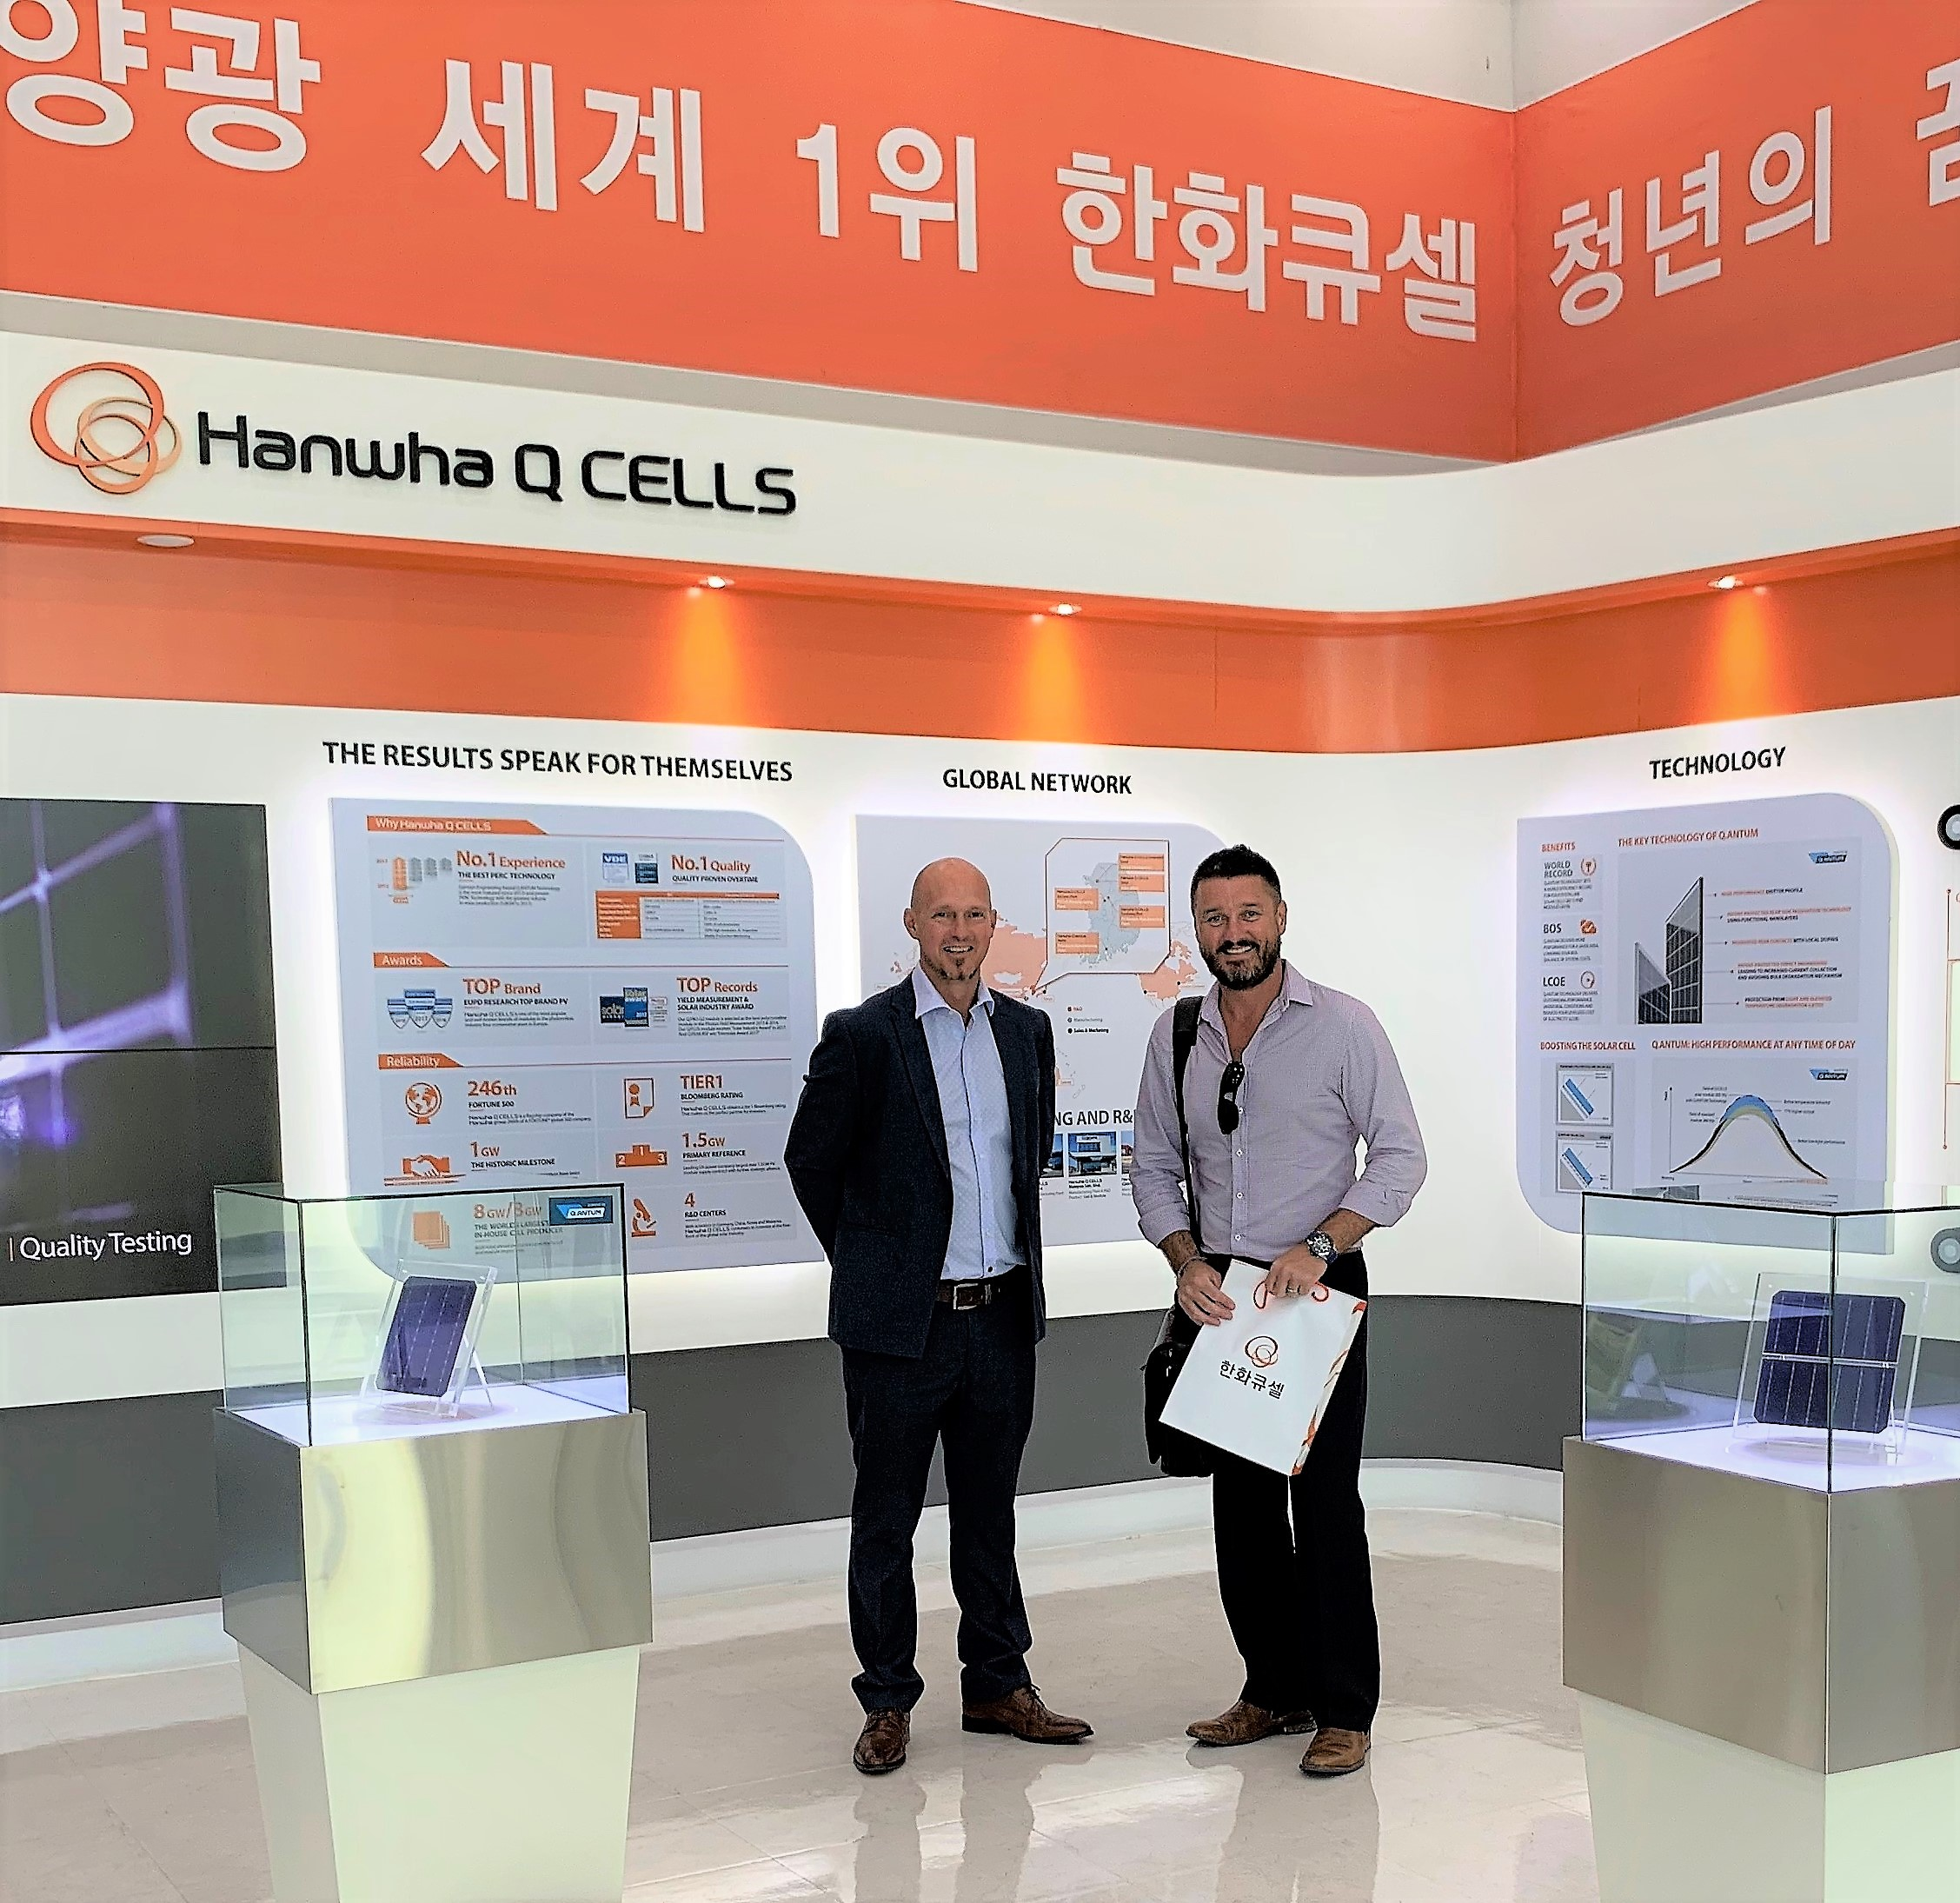 Hanwha Q CELL – South Korea